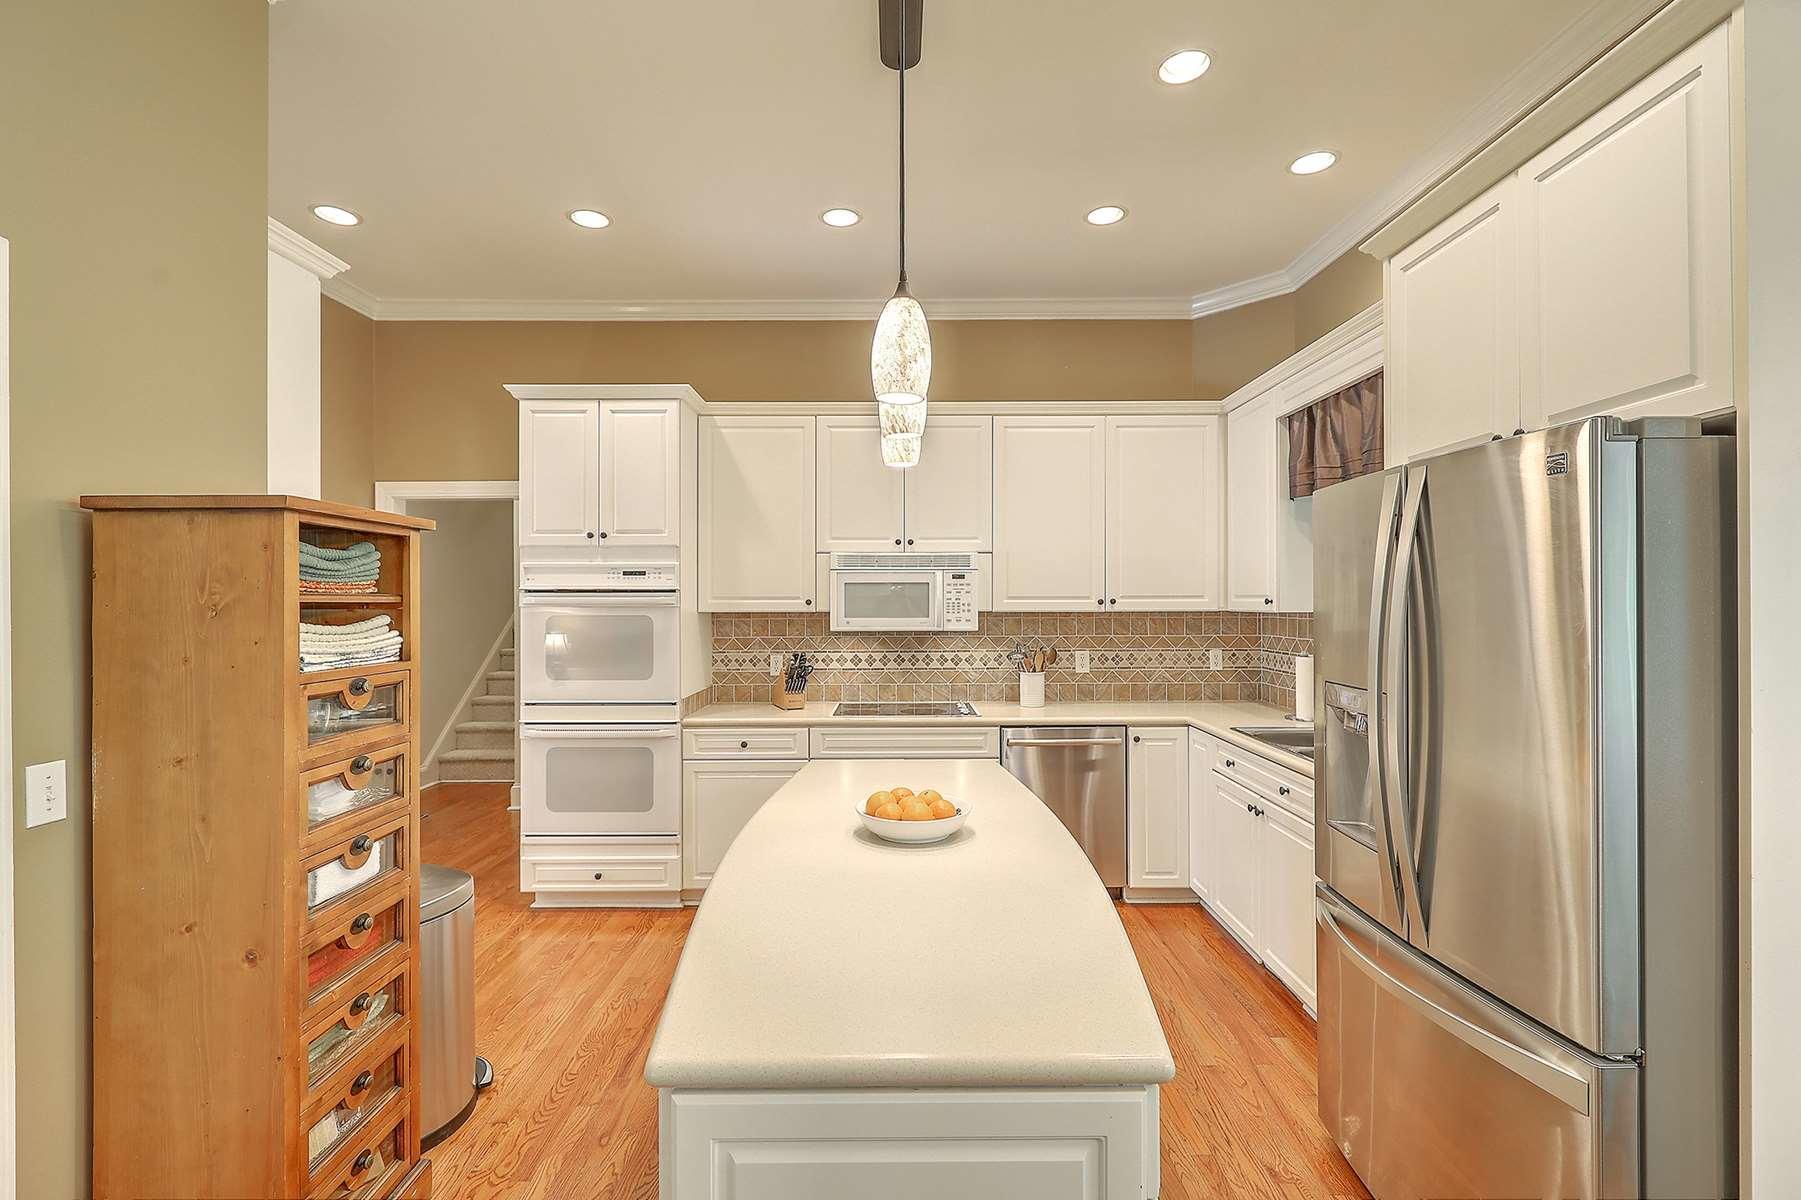 Dunes West Homes For Sale - 2961 Pignatelli, Mount Pleasant, SC - 8